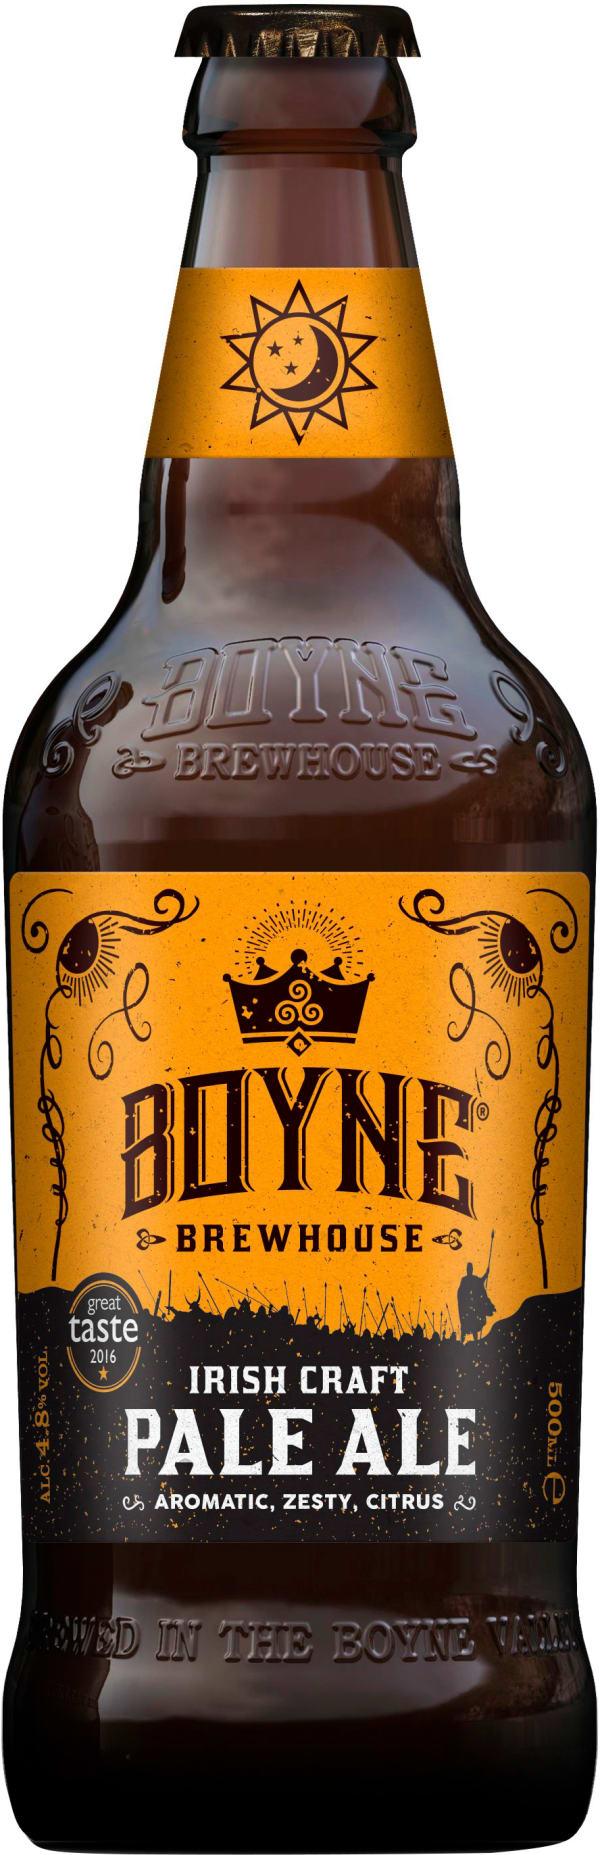 Boyne Irish Craft Pale Ale